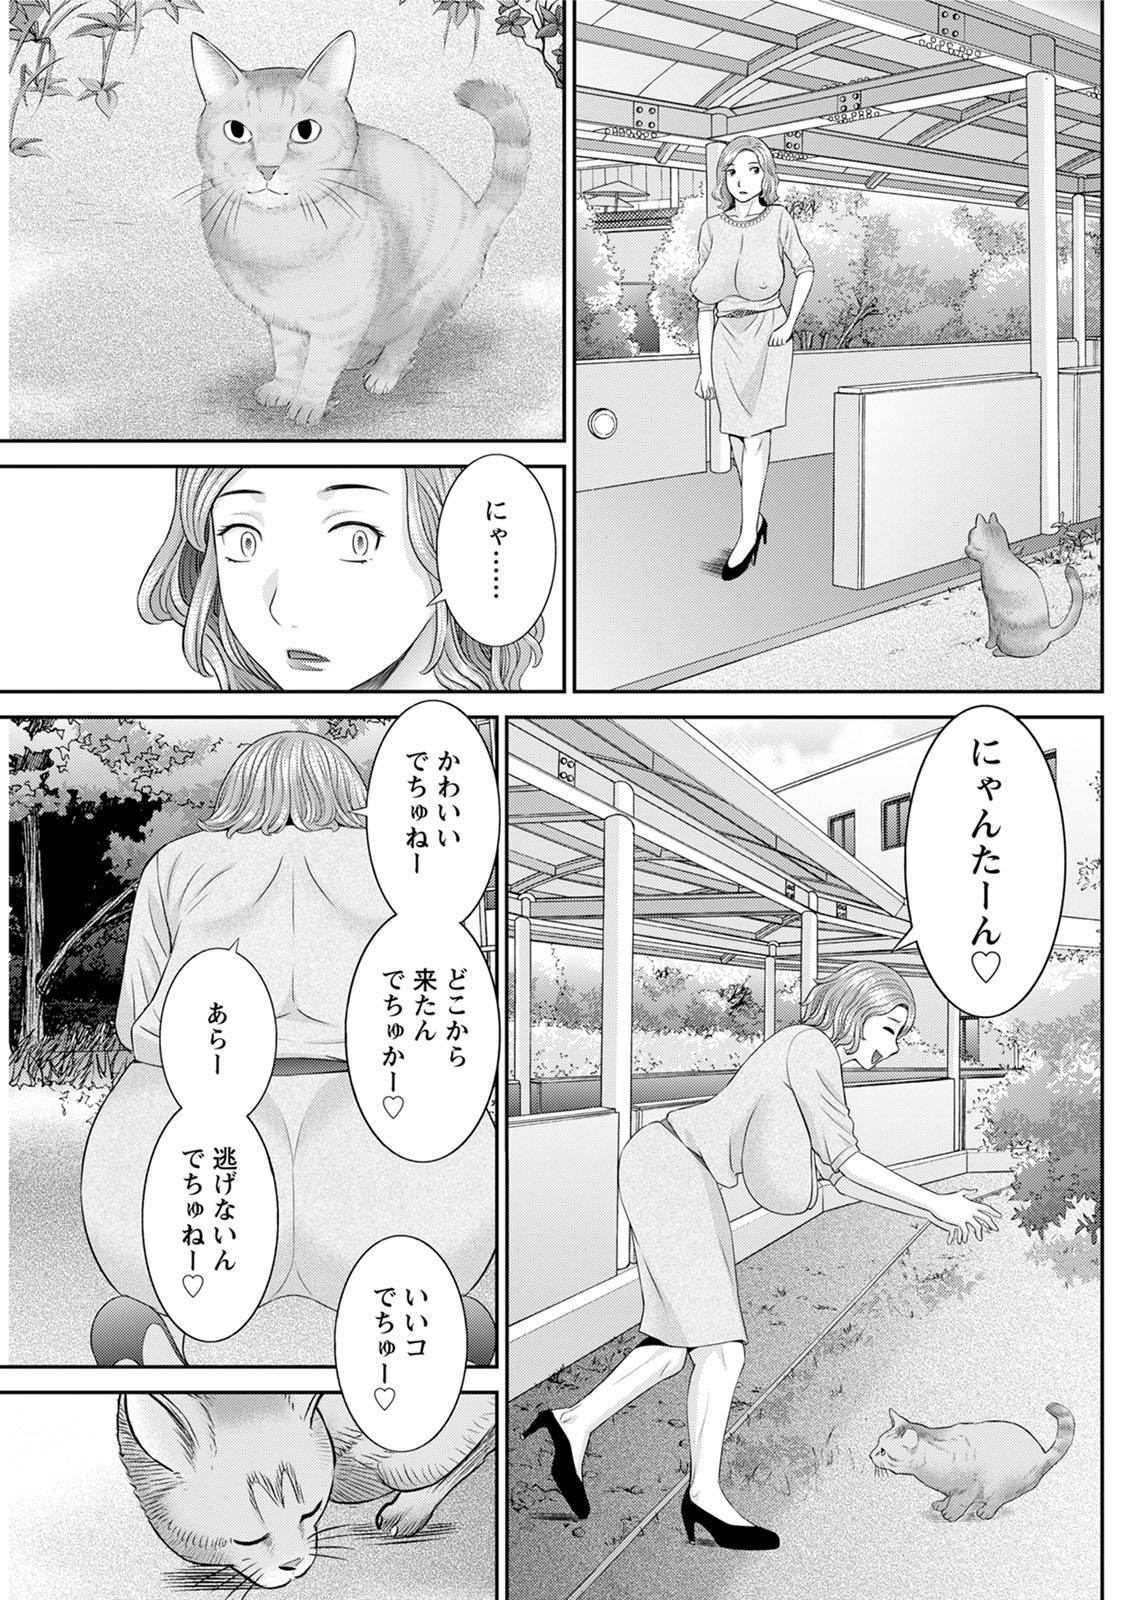 [Kawamori Misaki] Kaikan Hitotsuma Gakuen Ch. 1-6, 8-20 [Digital] 223